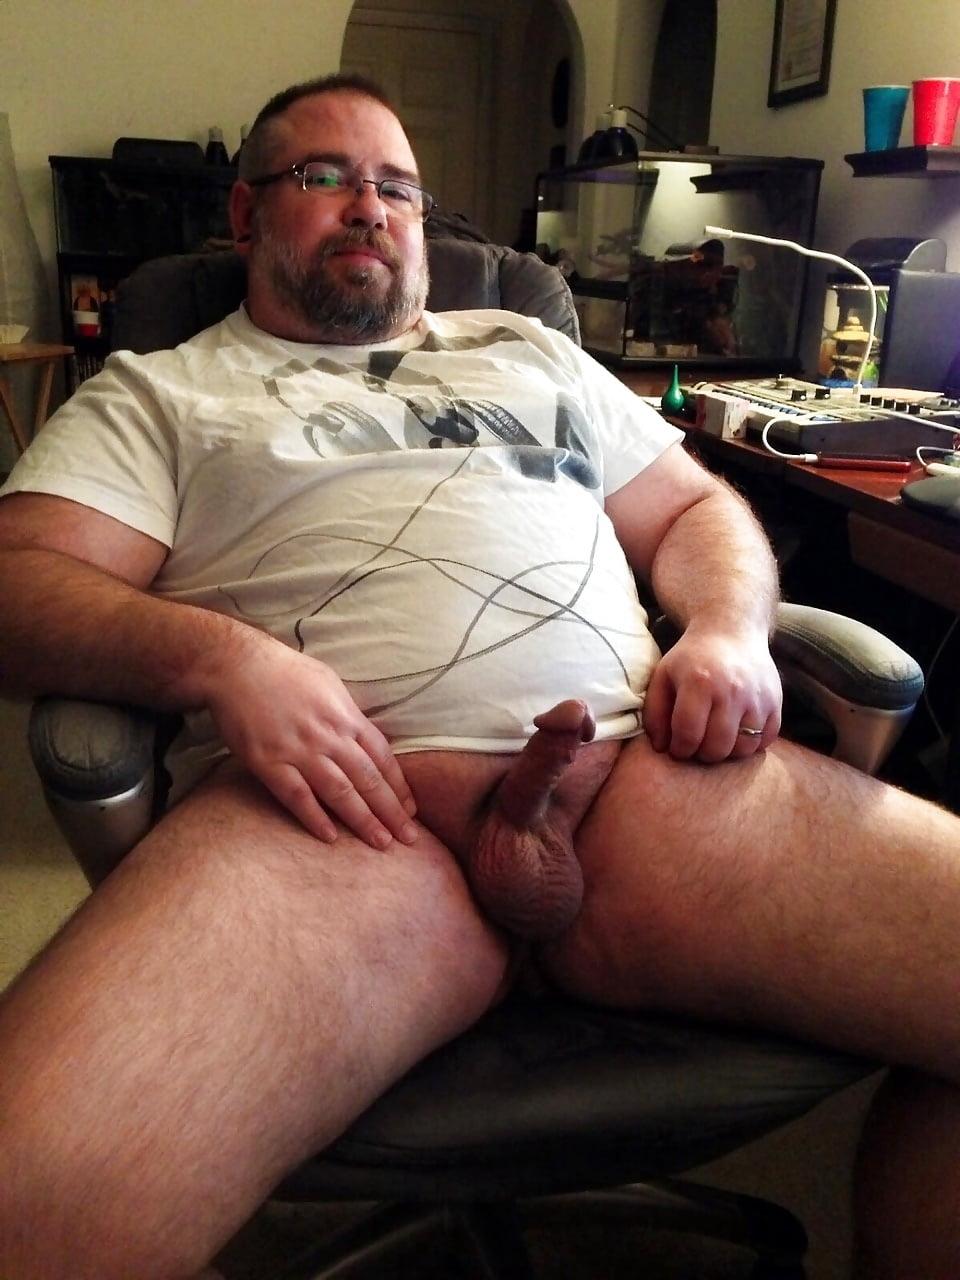 chubby-man-place-blogspot-video-vibrator-super